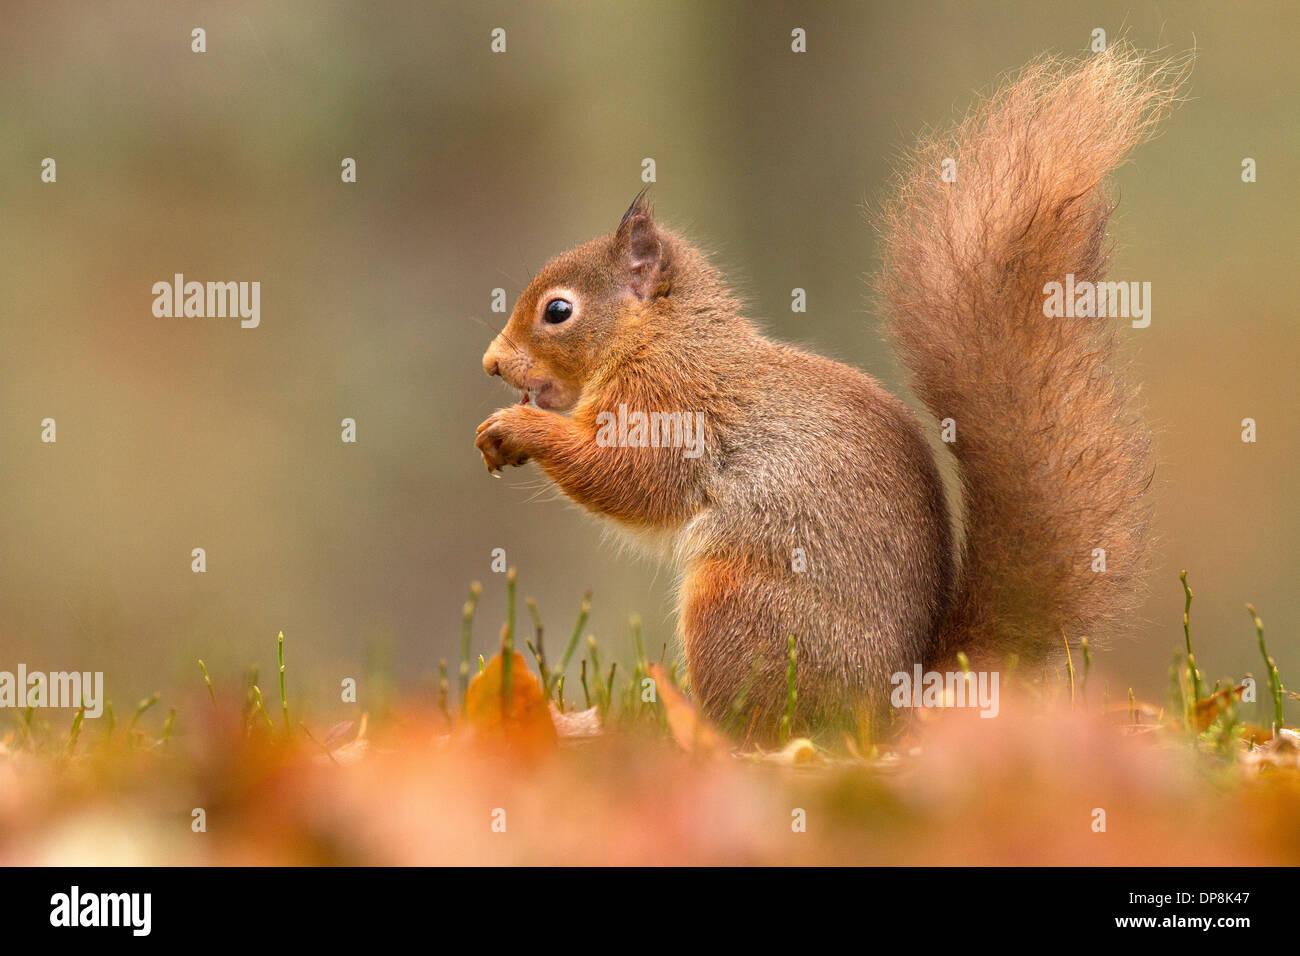 Red Squirrel, Sciurus vulgaris on the ground feeding - Stock Image